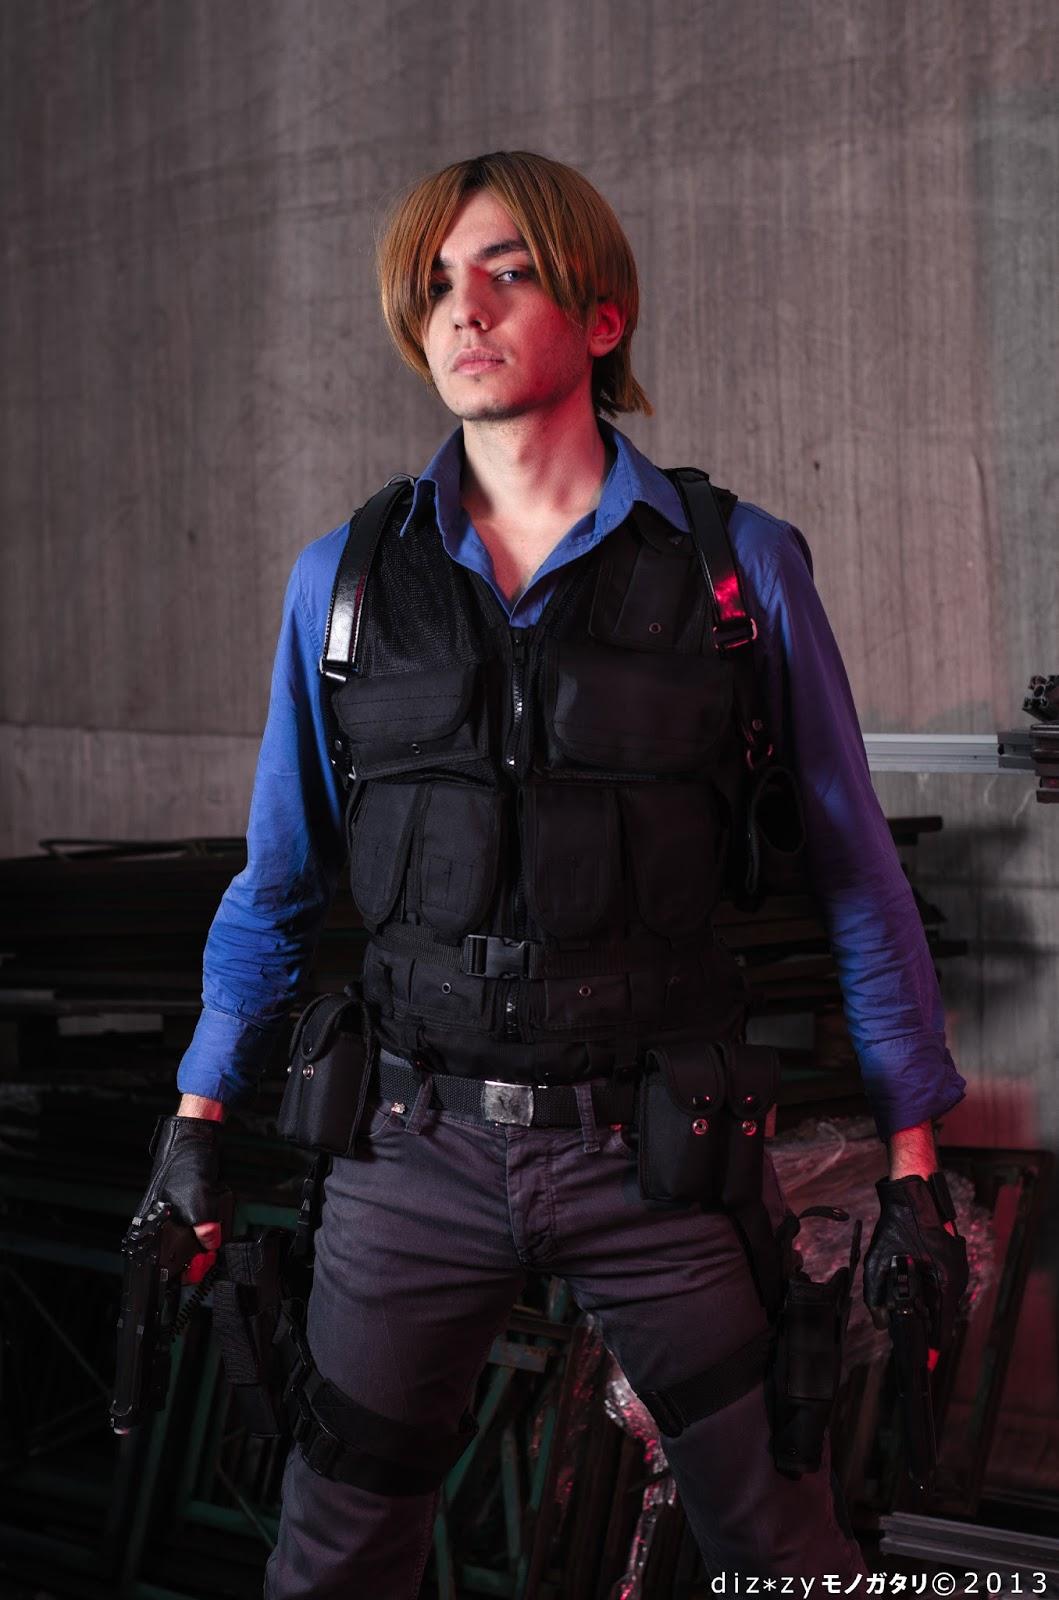 cosplay Resident evil 5